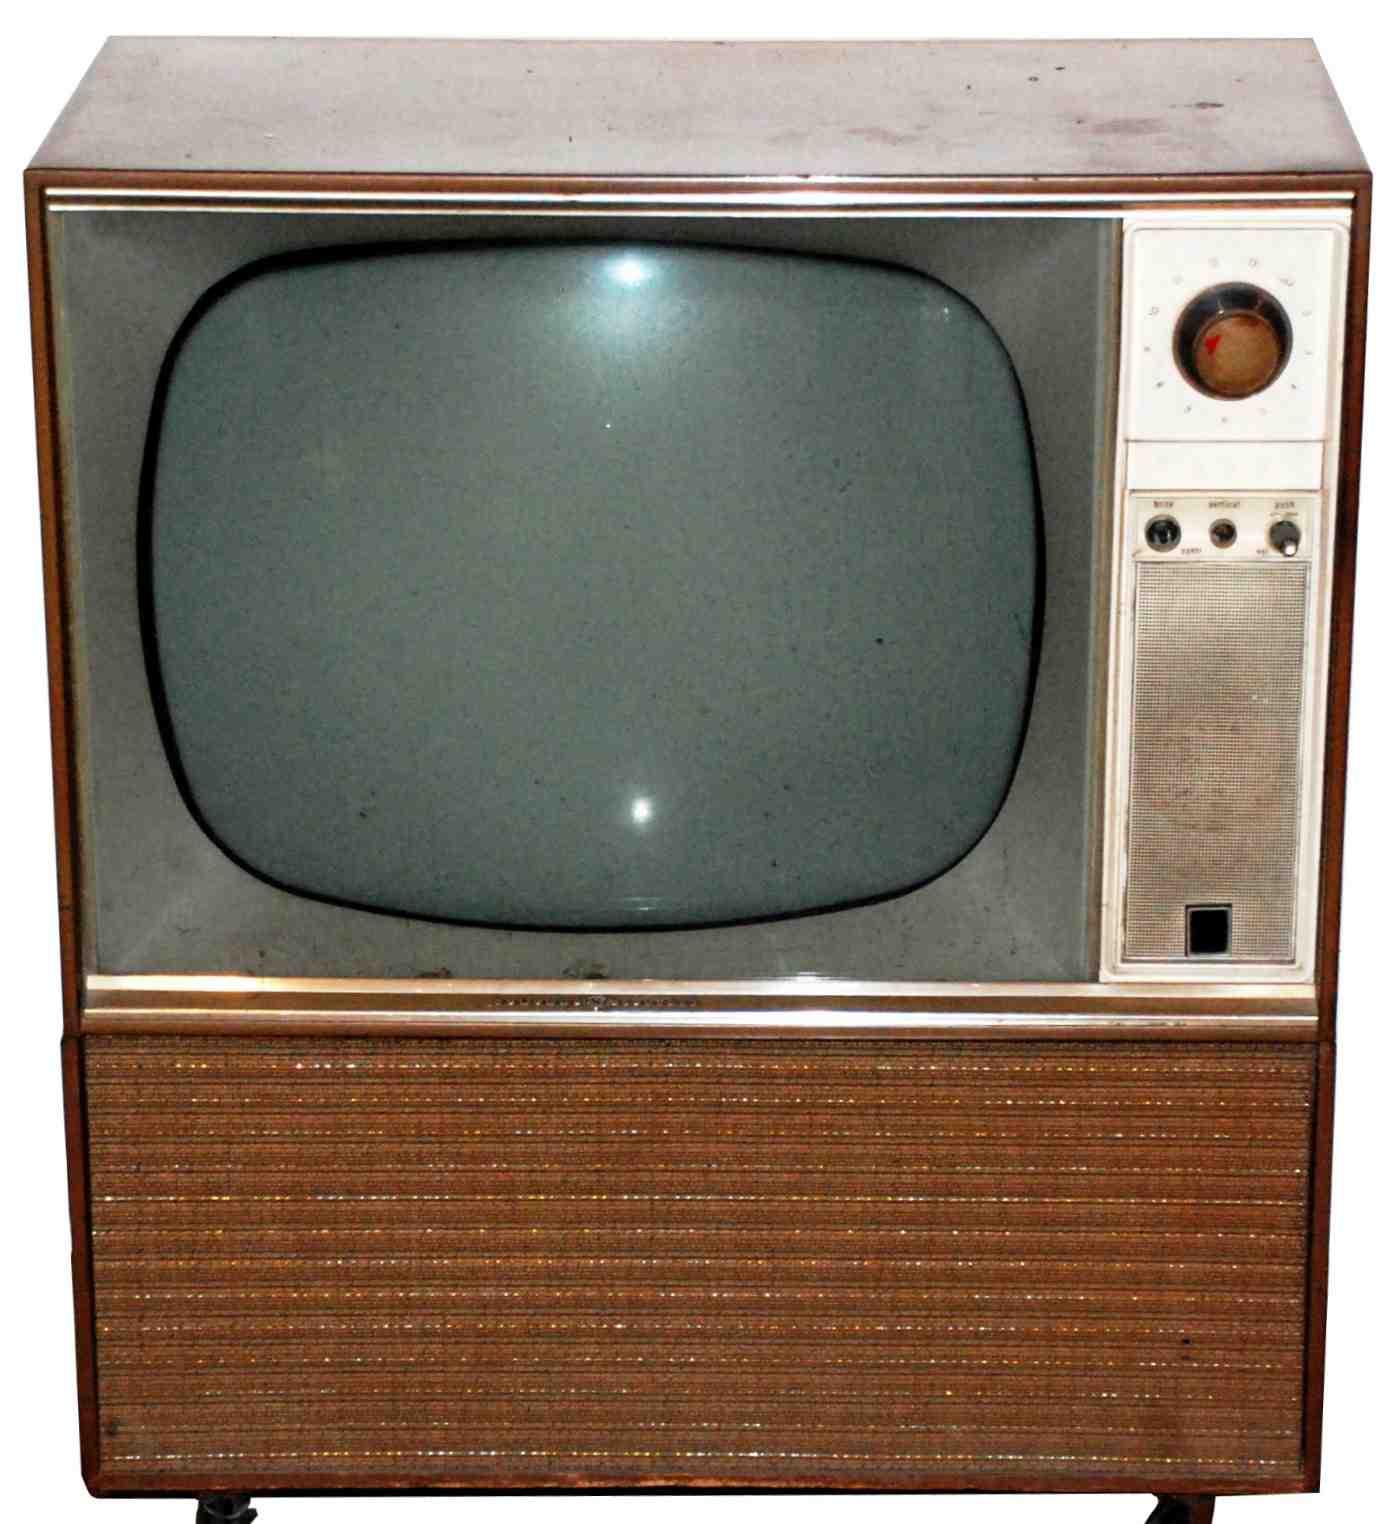 Televisore vecchio stampo autosvezzamento